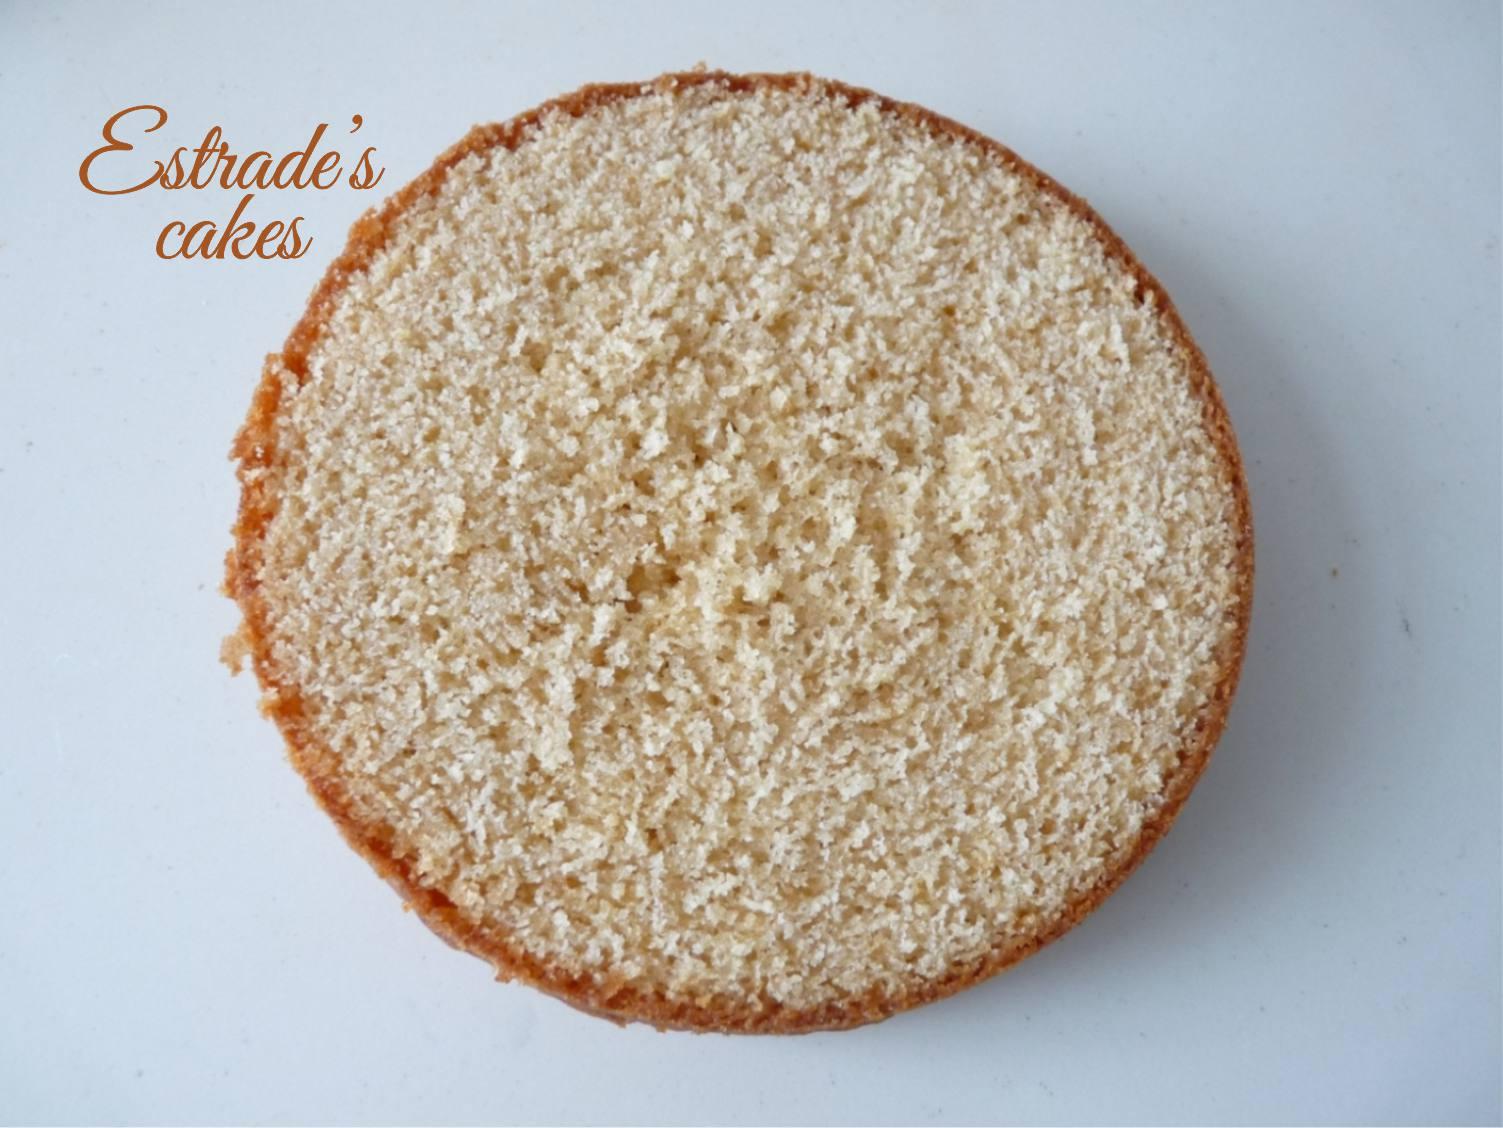 receta de bizcocho de leche caliente de Miette - 4